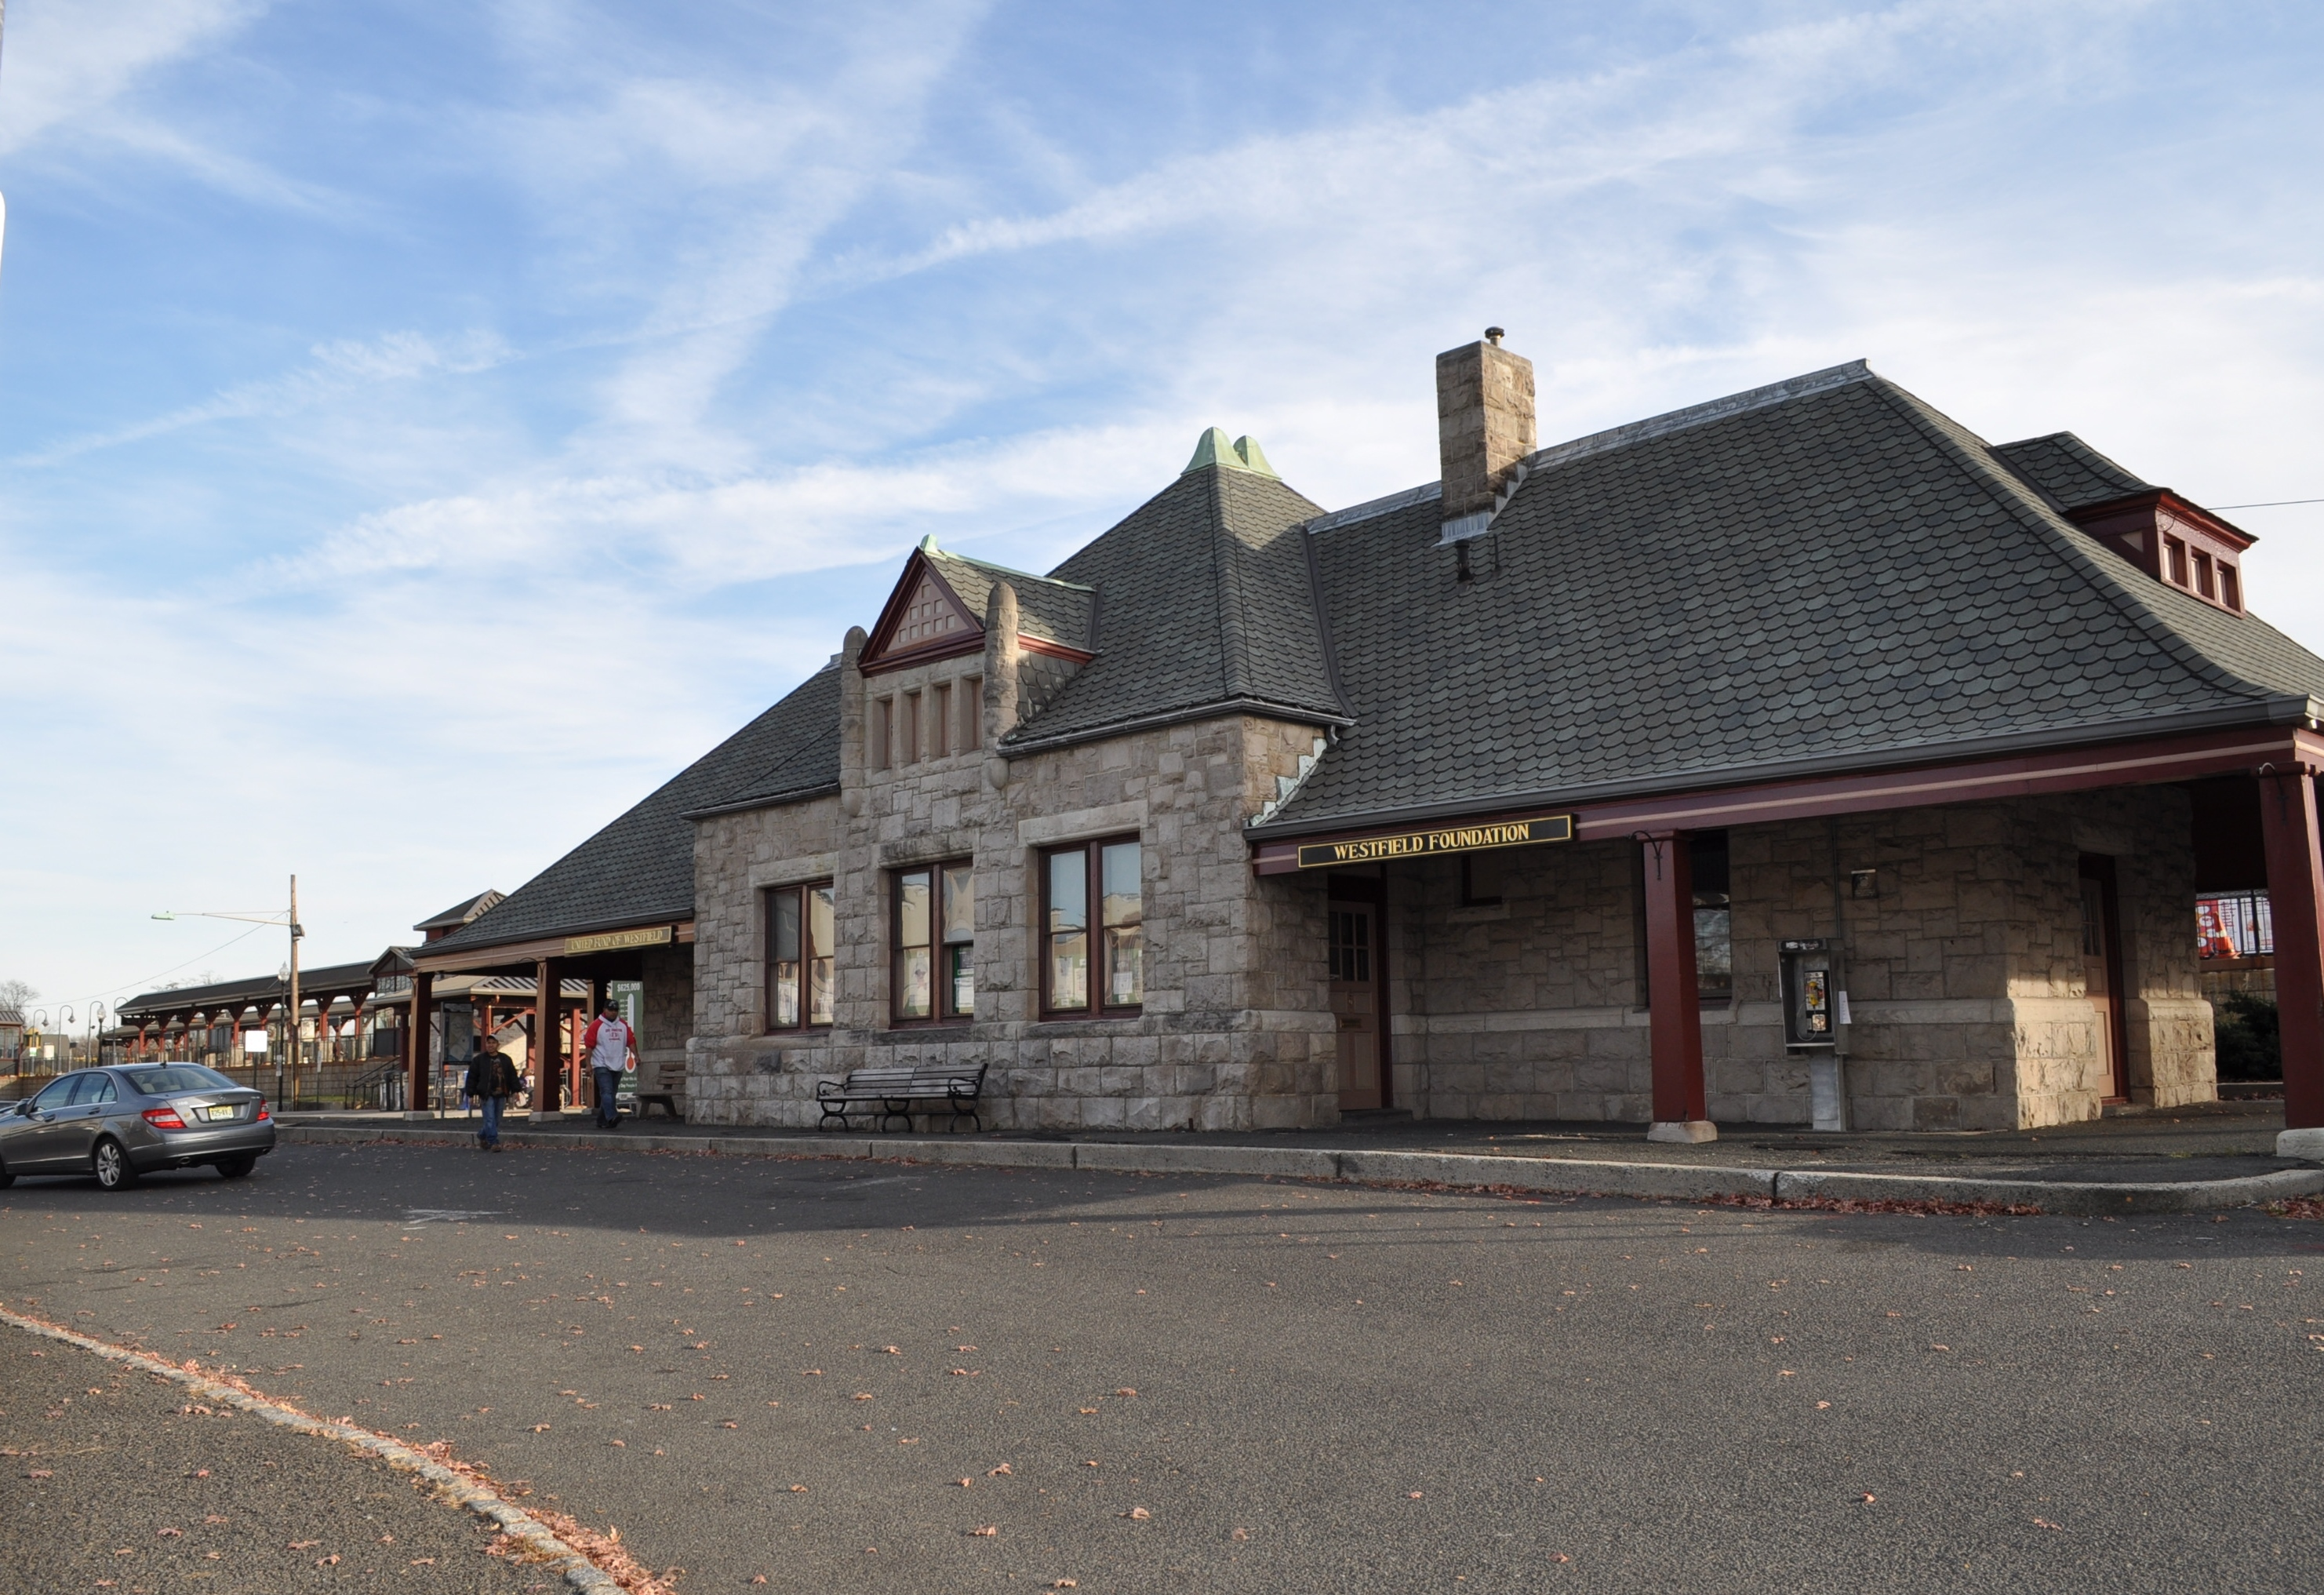 bf0f6d987b0c115ce705_train_station.JPG